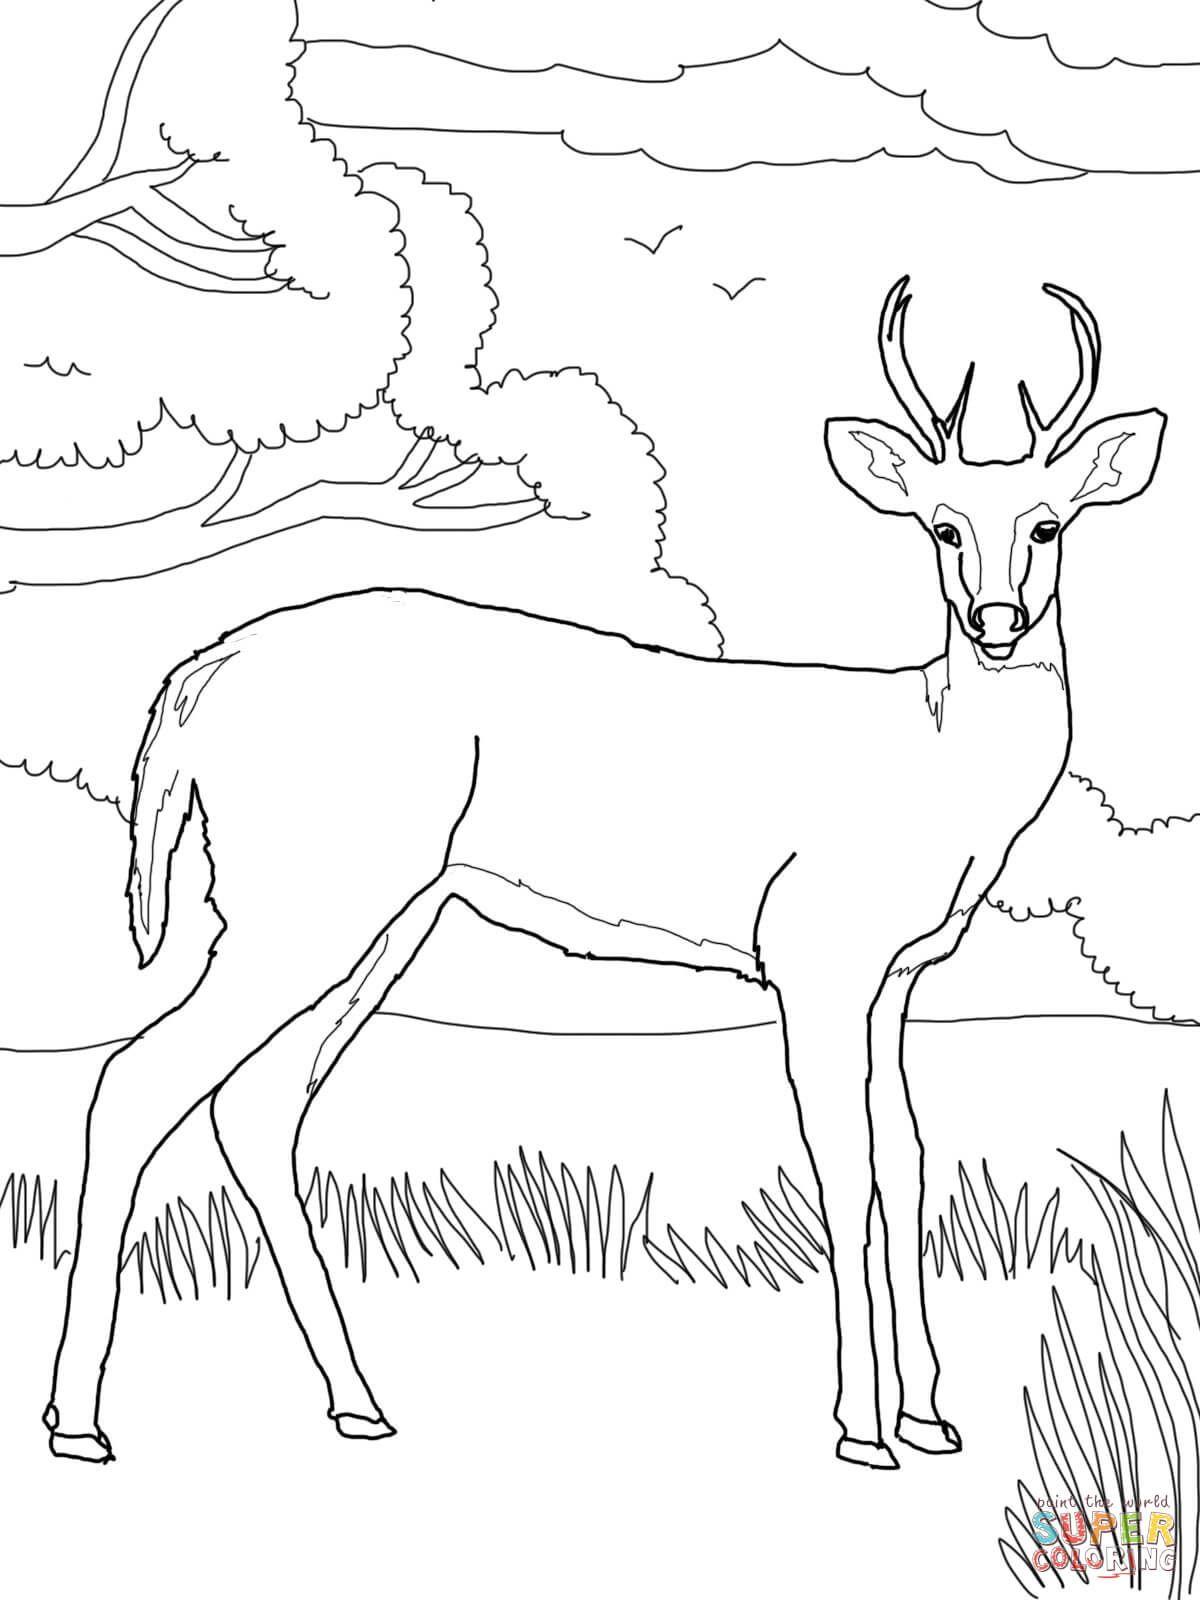 Whitetail Deer Coloring Page Free Printable Coloring Pages Deer Coloring Pages Coloring Pages Free Printable Coloring Pages